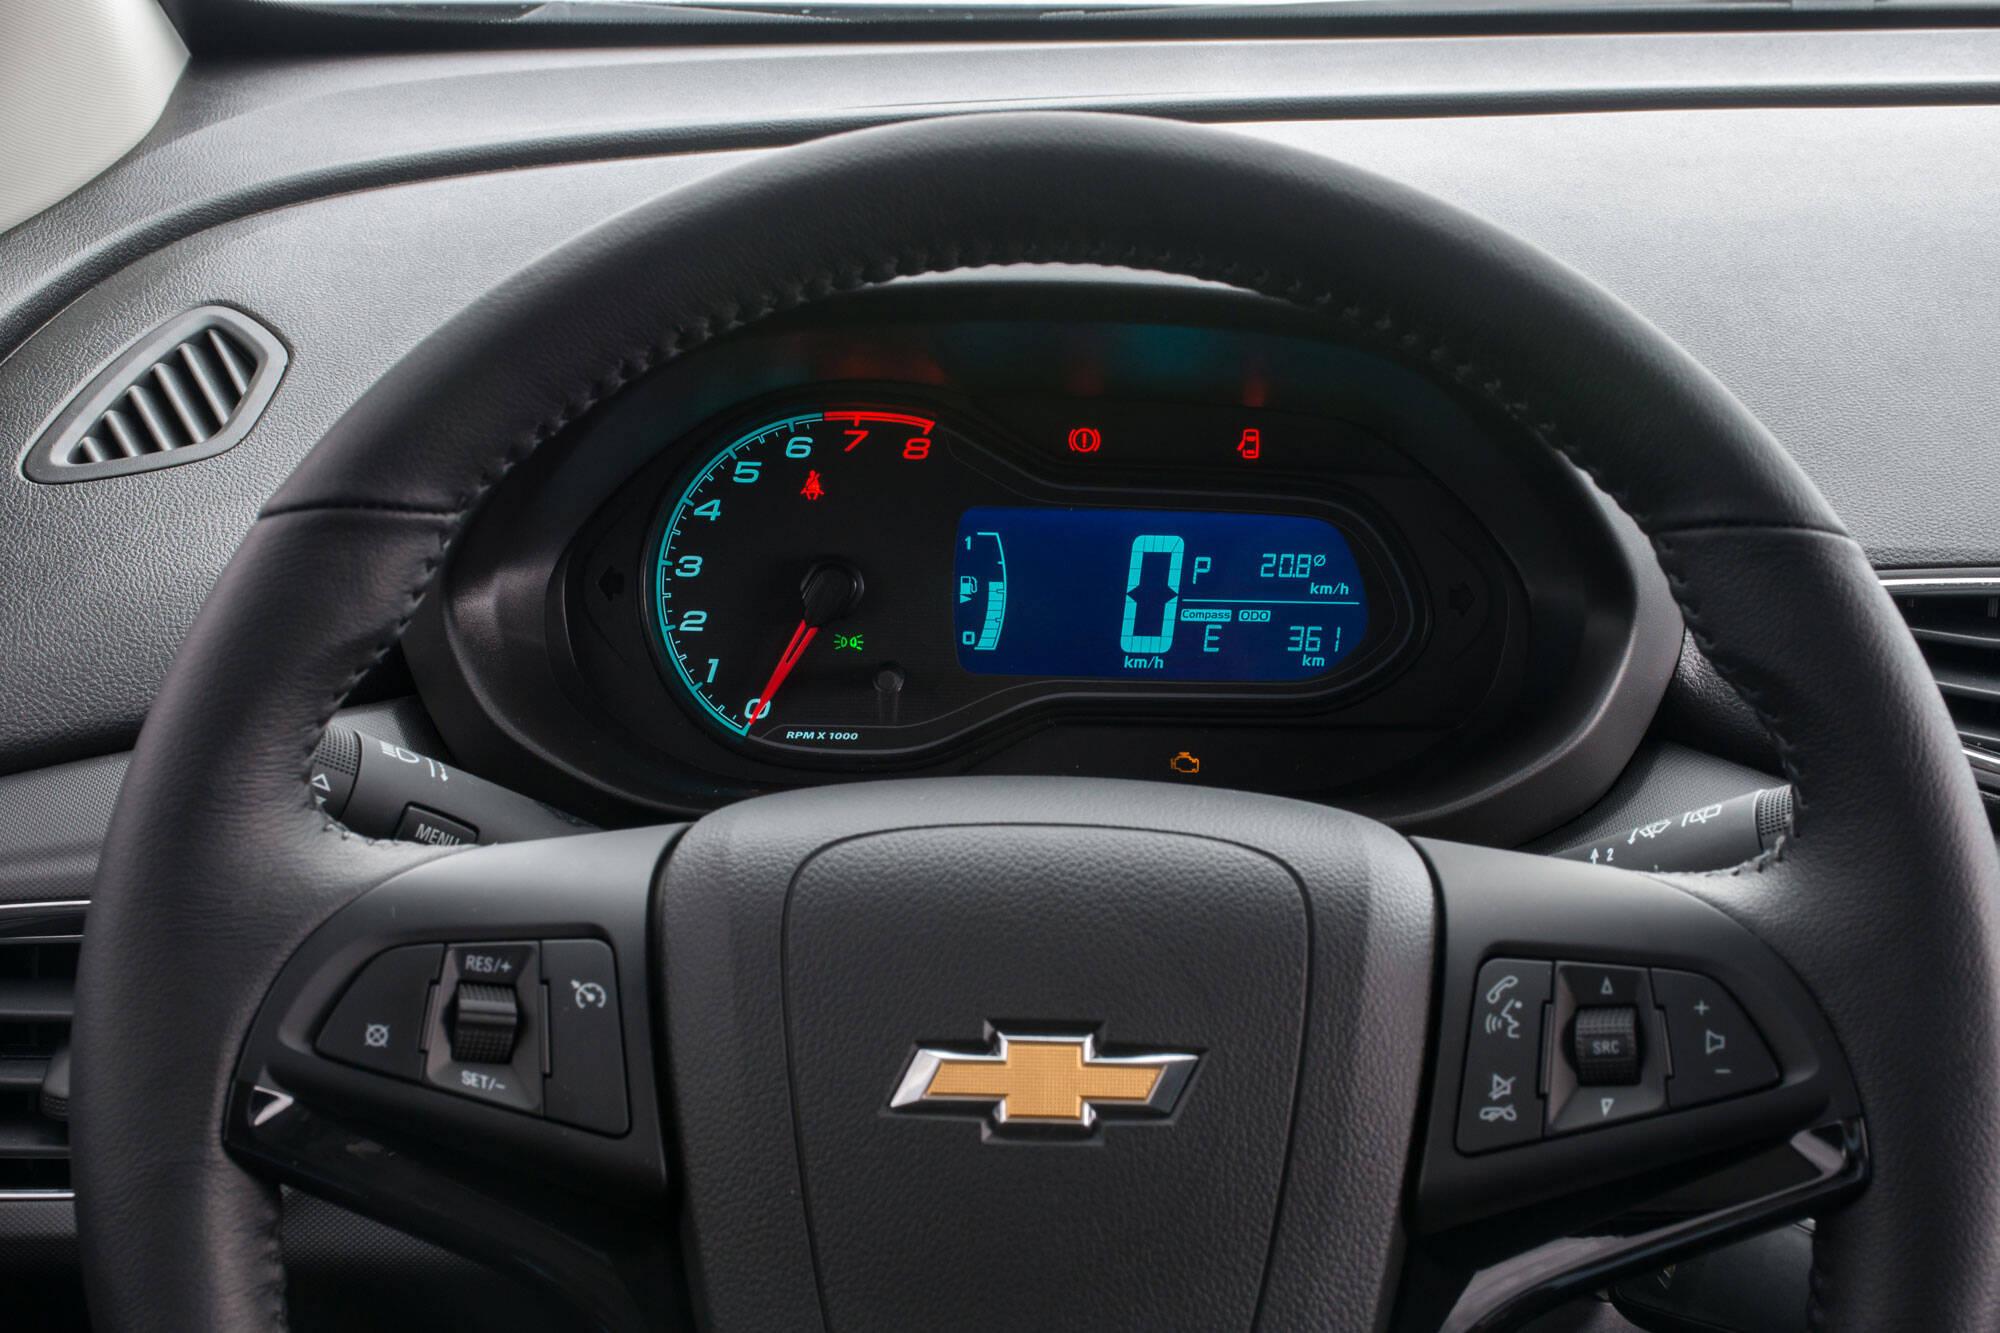 Chevrolet Onix 2017. Foto: Divulgação/General Motors